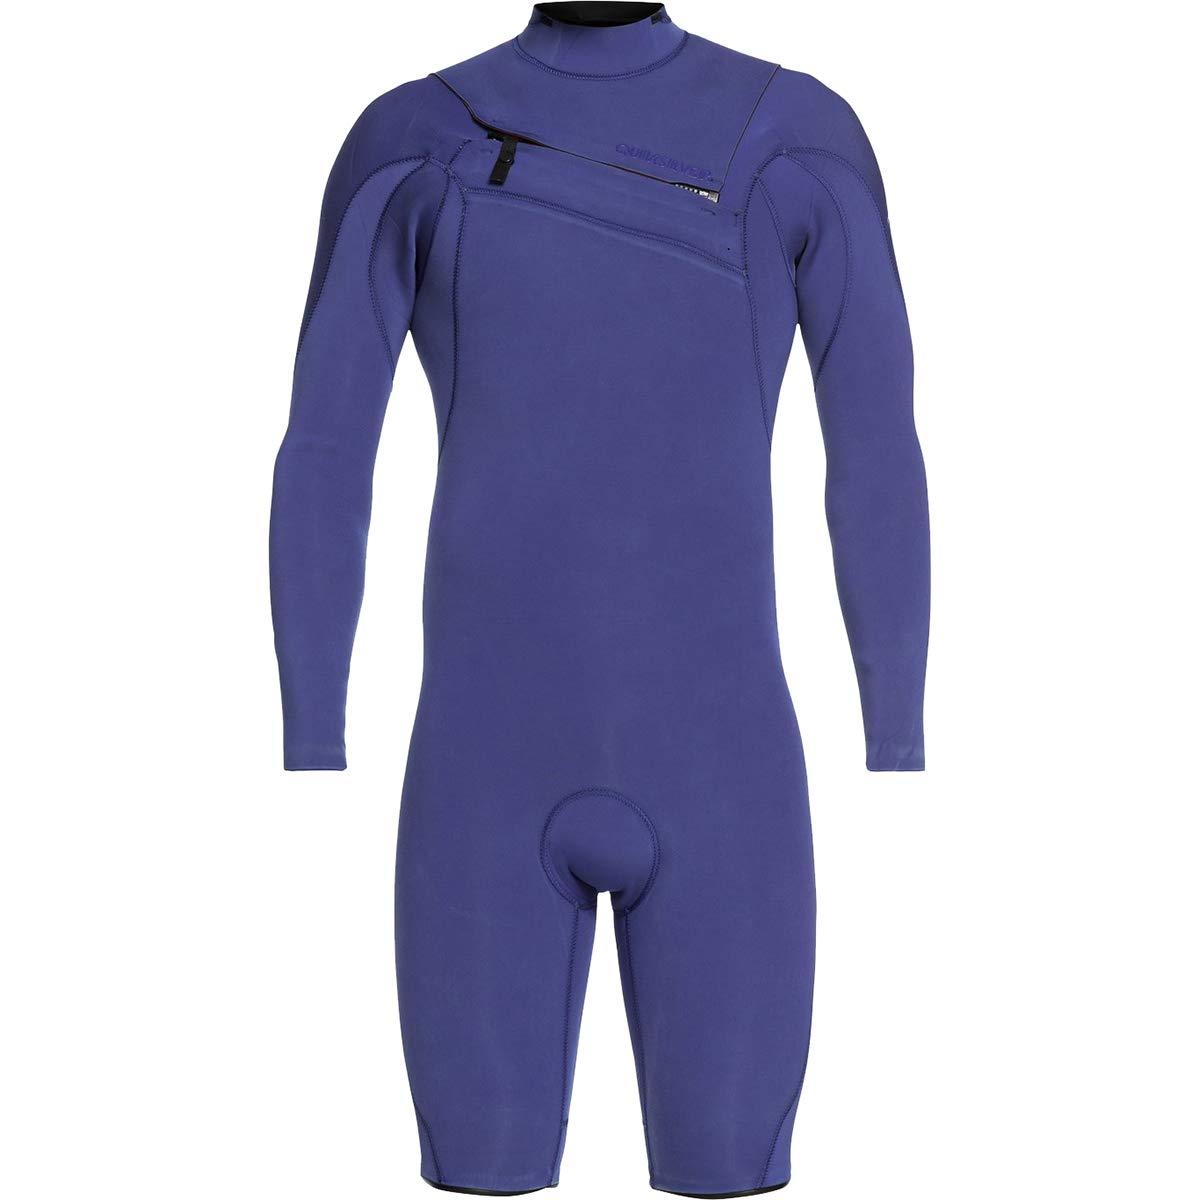 Quiksilver Highline Limited 2/2mm Men's Full Wetsuits - Nite Blue/Medium